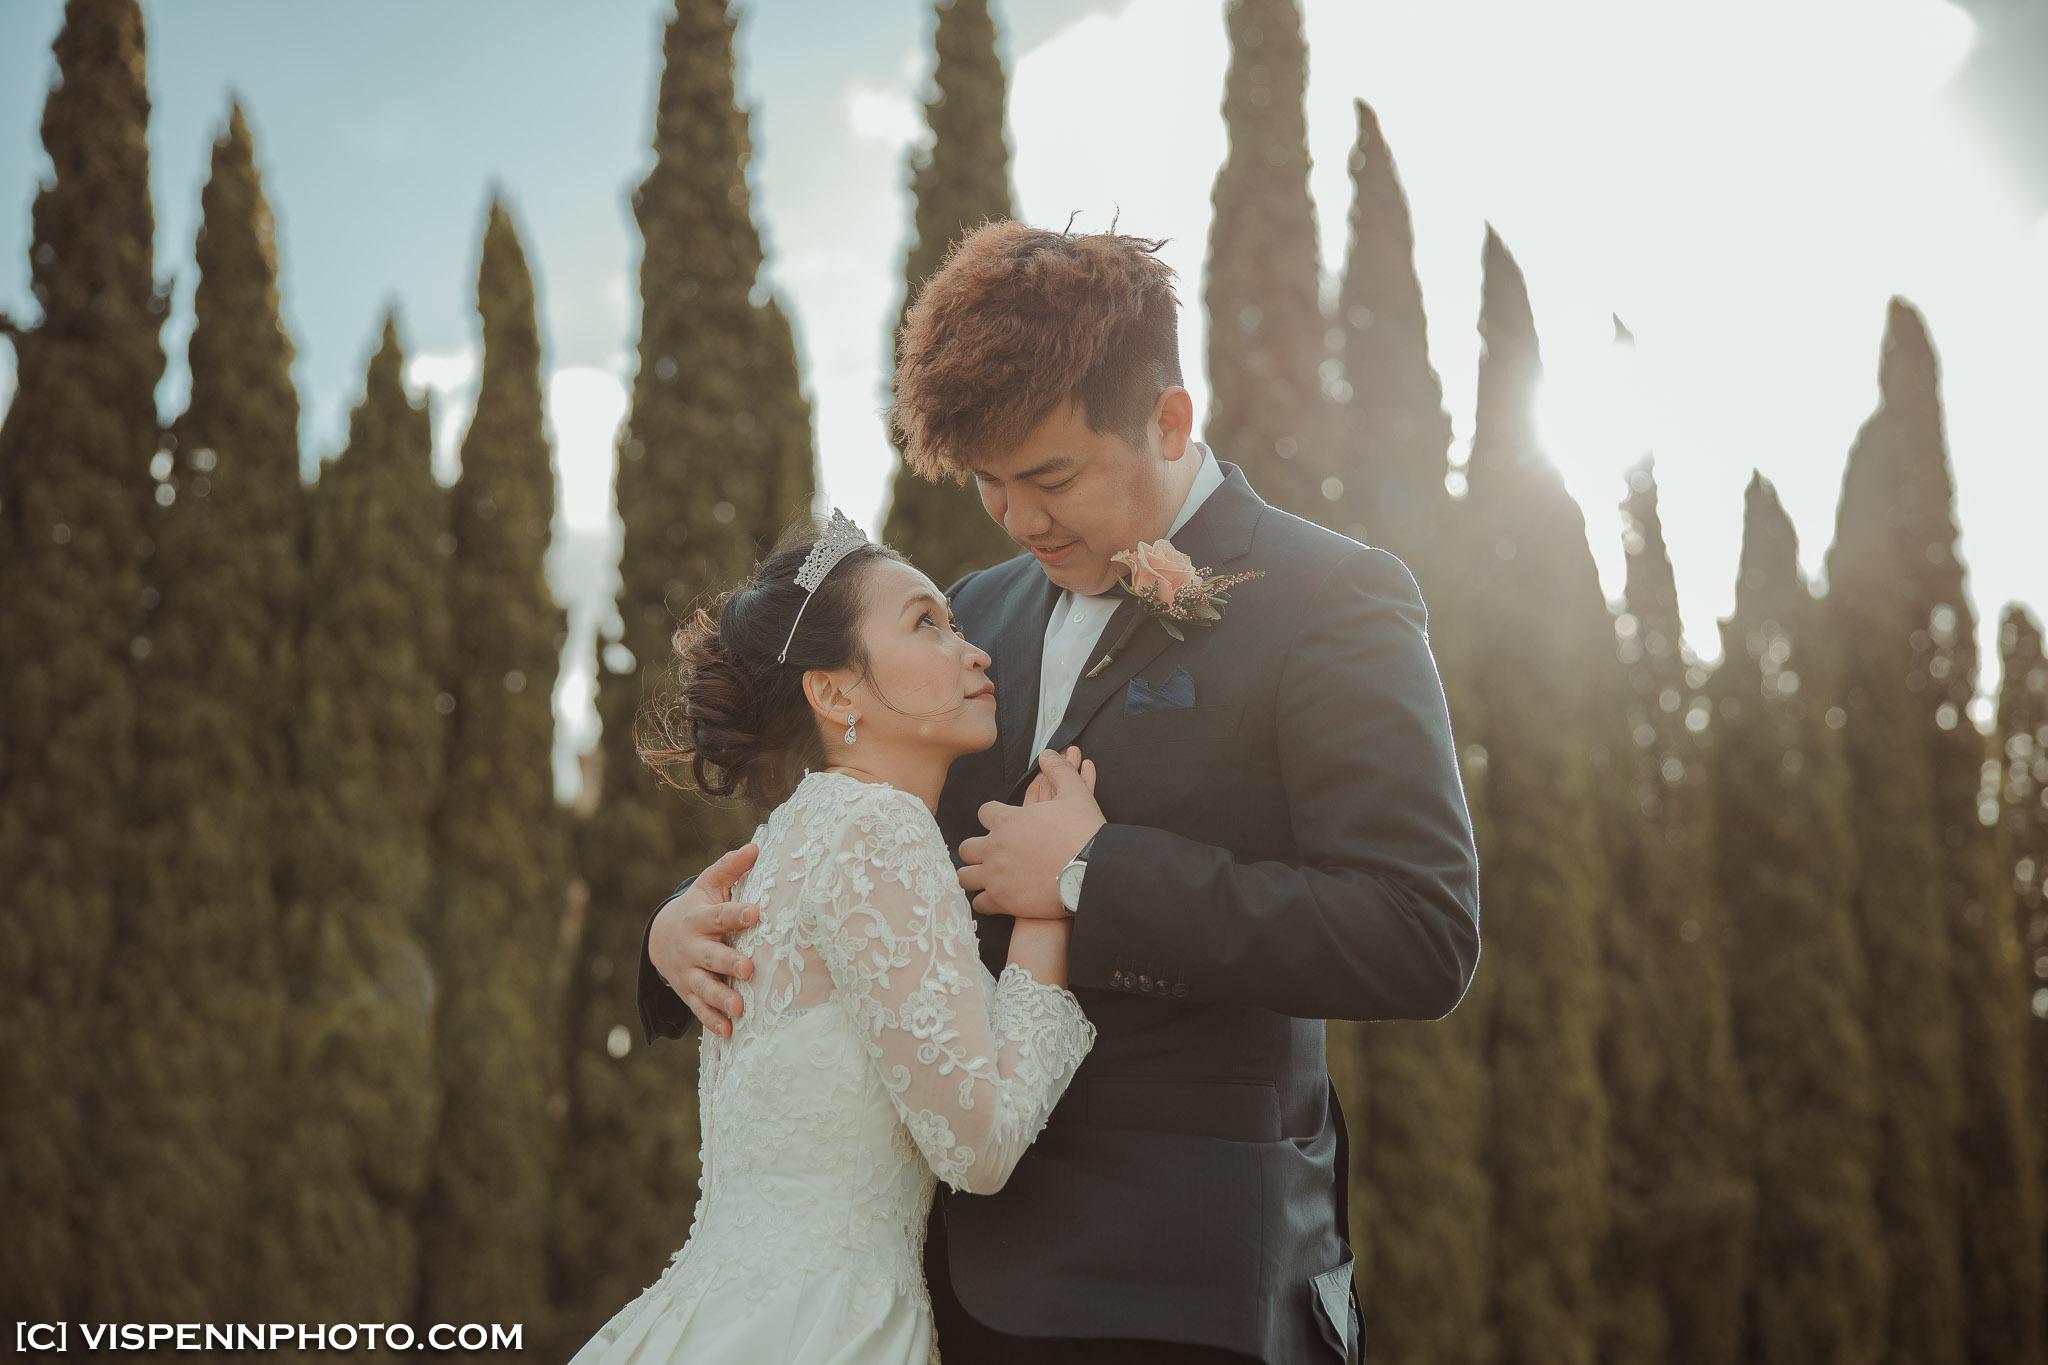 WEDDING DAY Photography Melbourne VISPENN 墨尔本 婚礼跟拍 婚礼摄像 婚礼摄影 结婚照 登记照 CoreyCoco 1P 02935 EOSR VISPENN